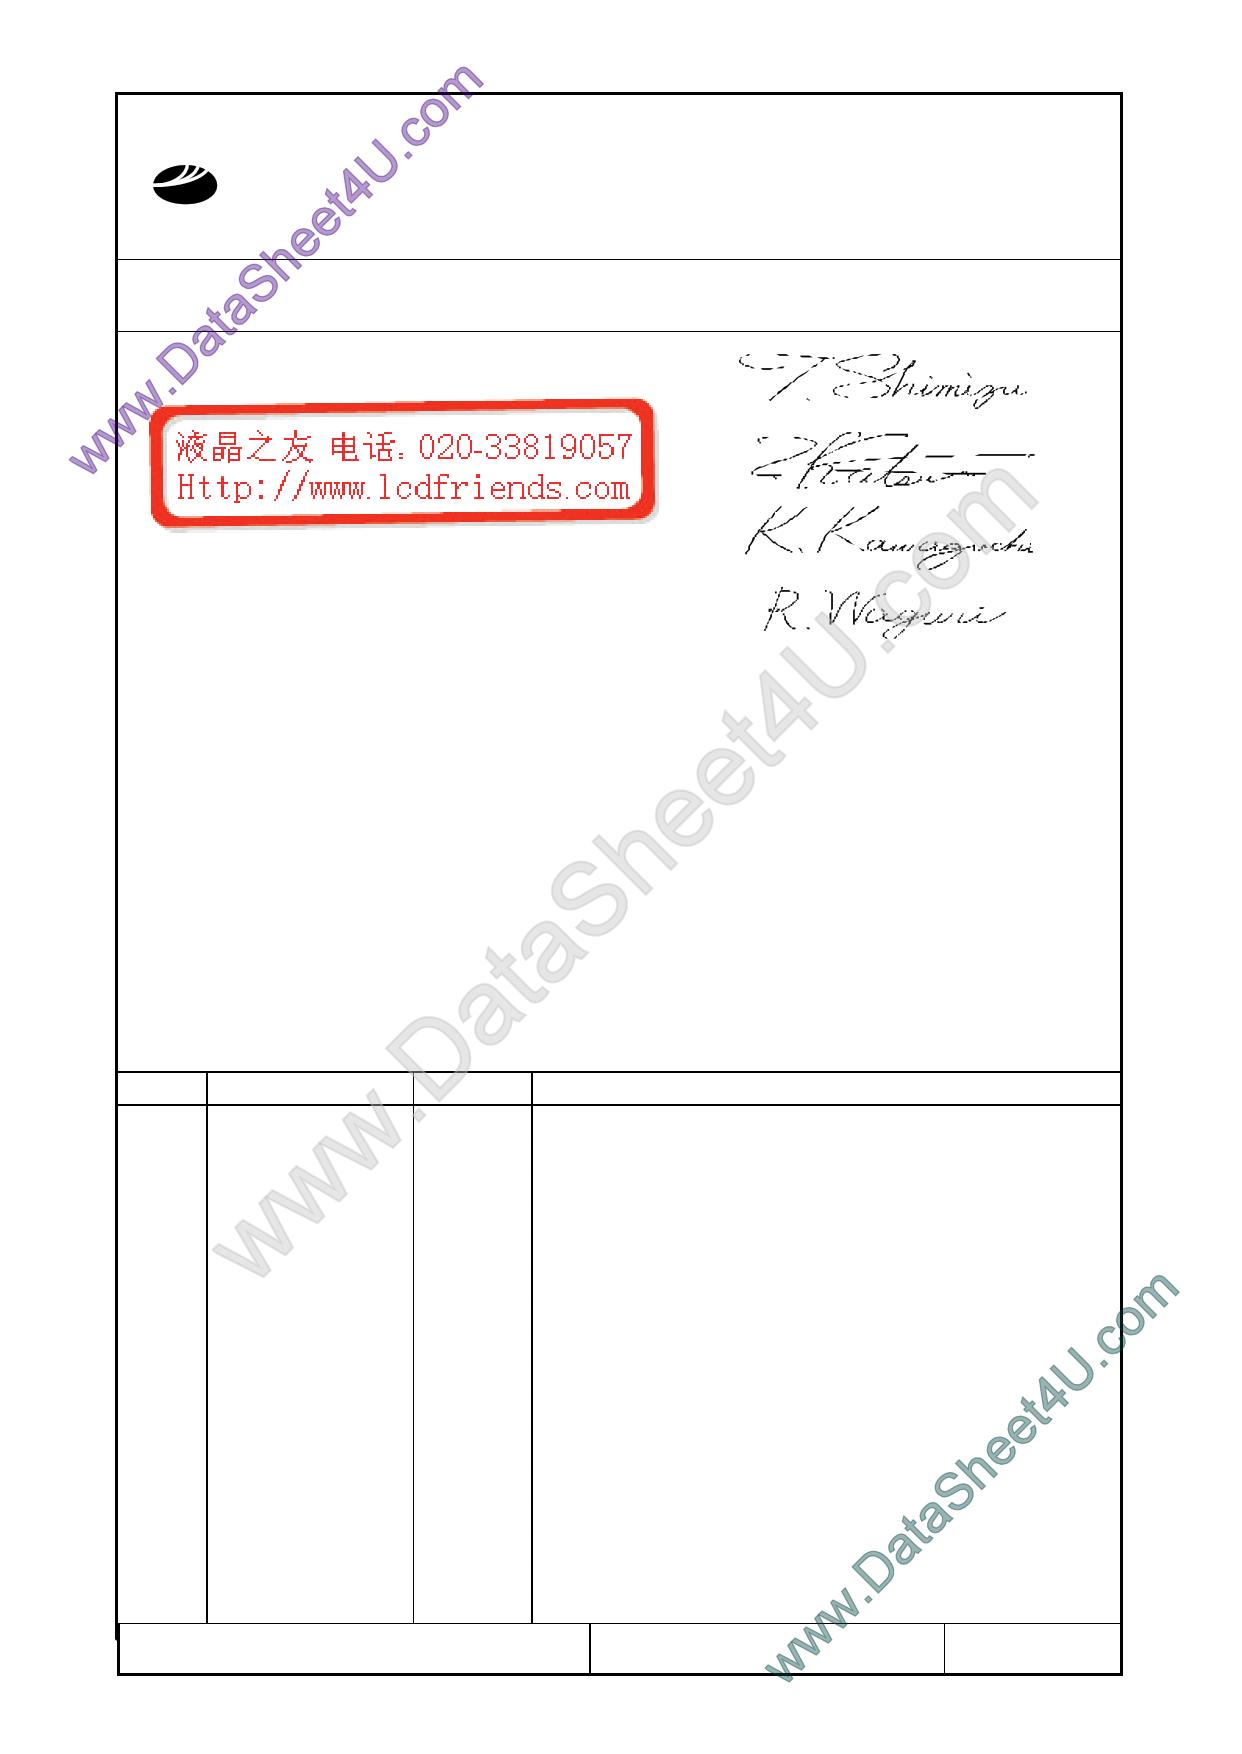 F-51553GNBJ-LW-AB datasheet